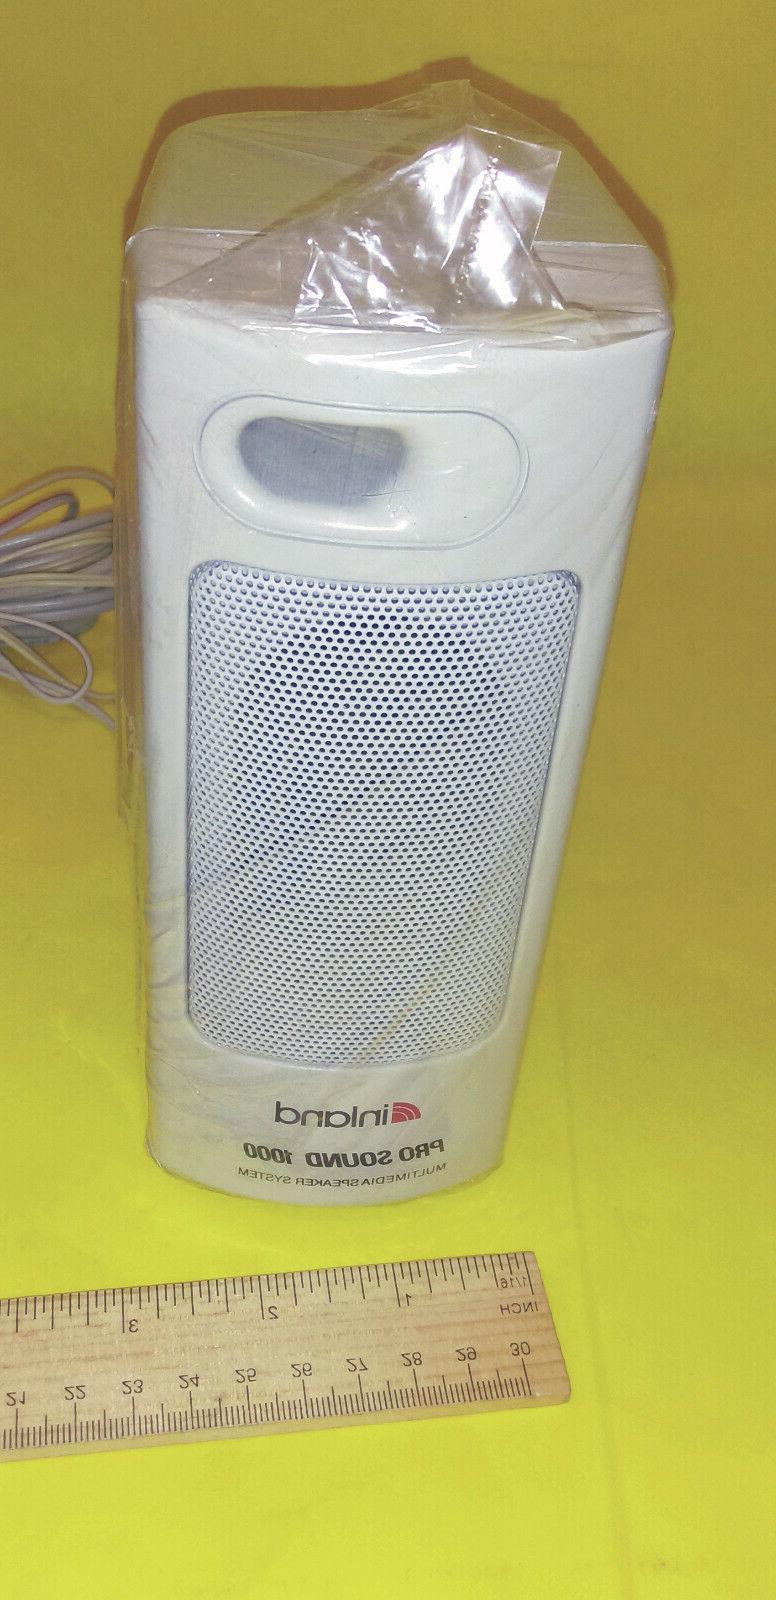 Genuine Inland PRO PC, Notebook, Speakers